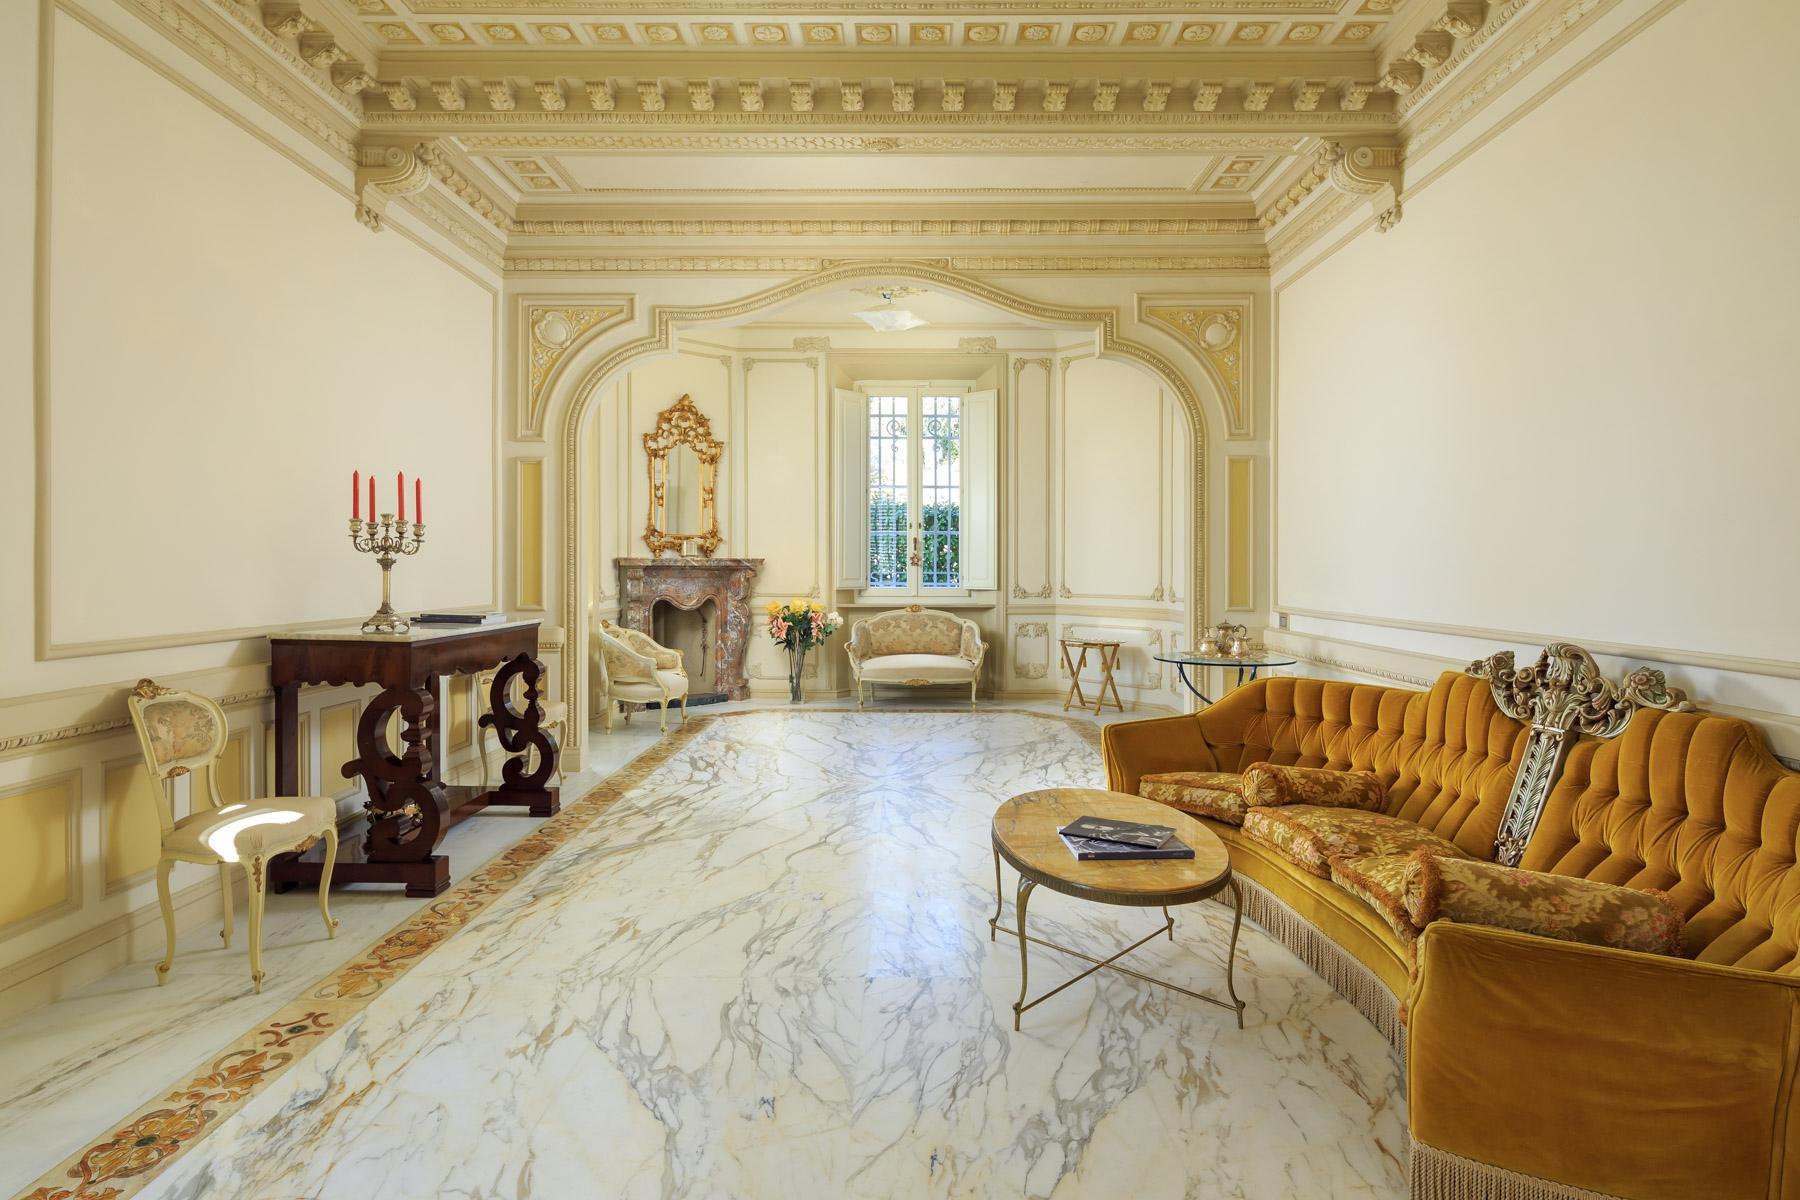 Montecatini Terme小镇优雅的新艺术风格的别墅 - 3